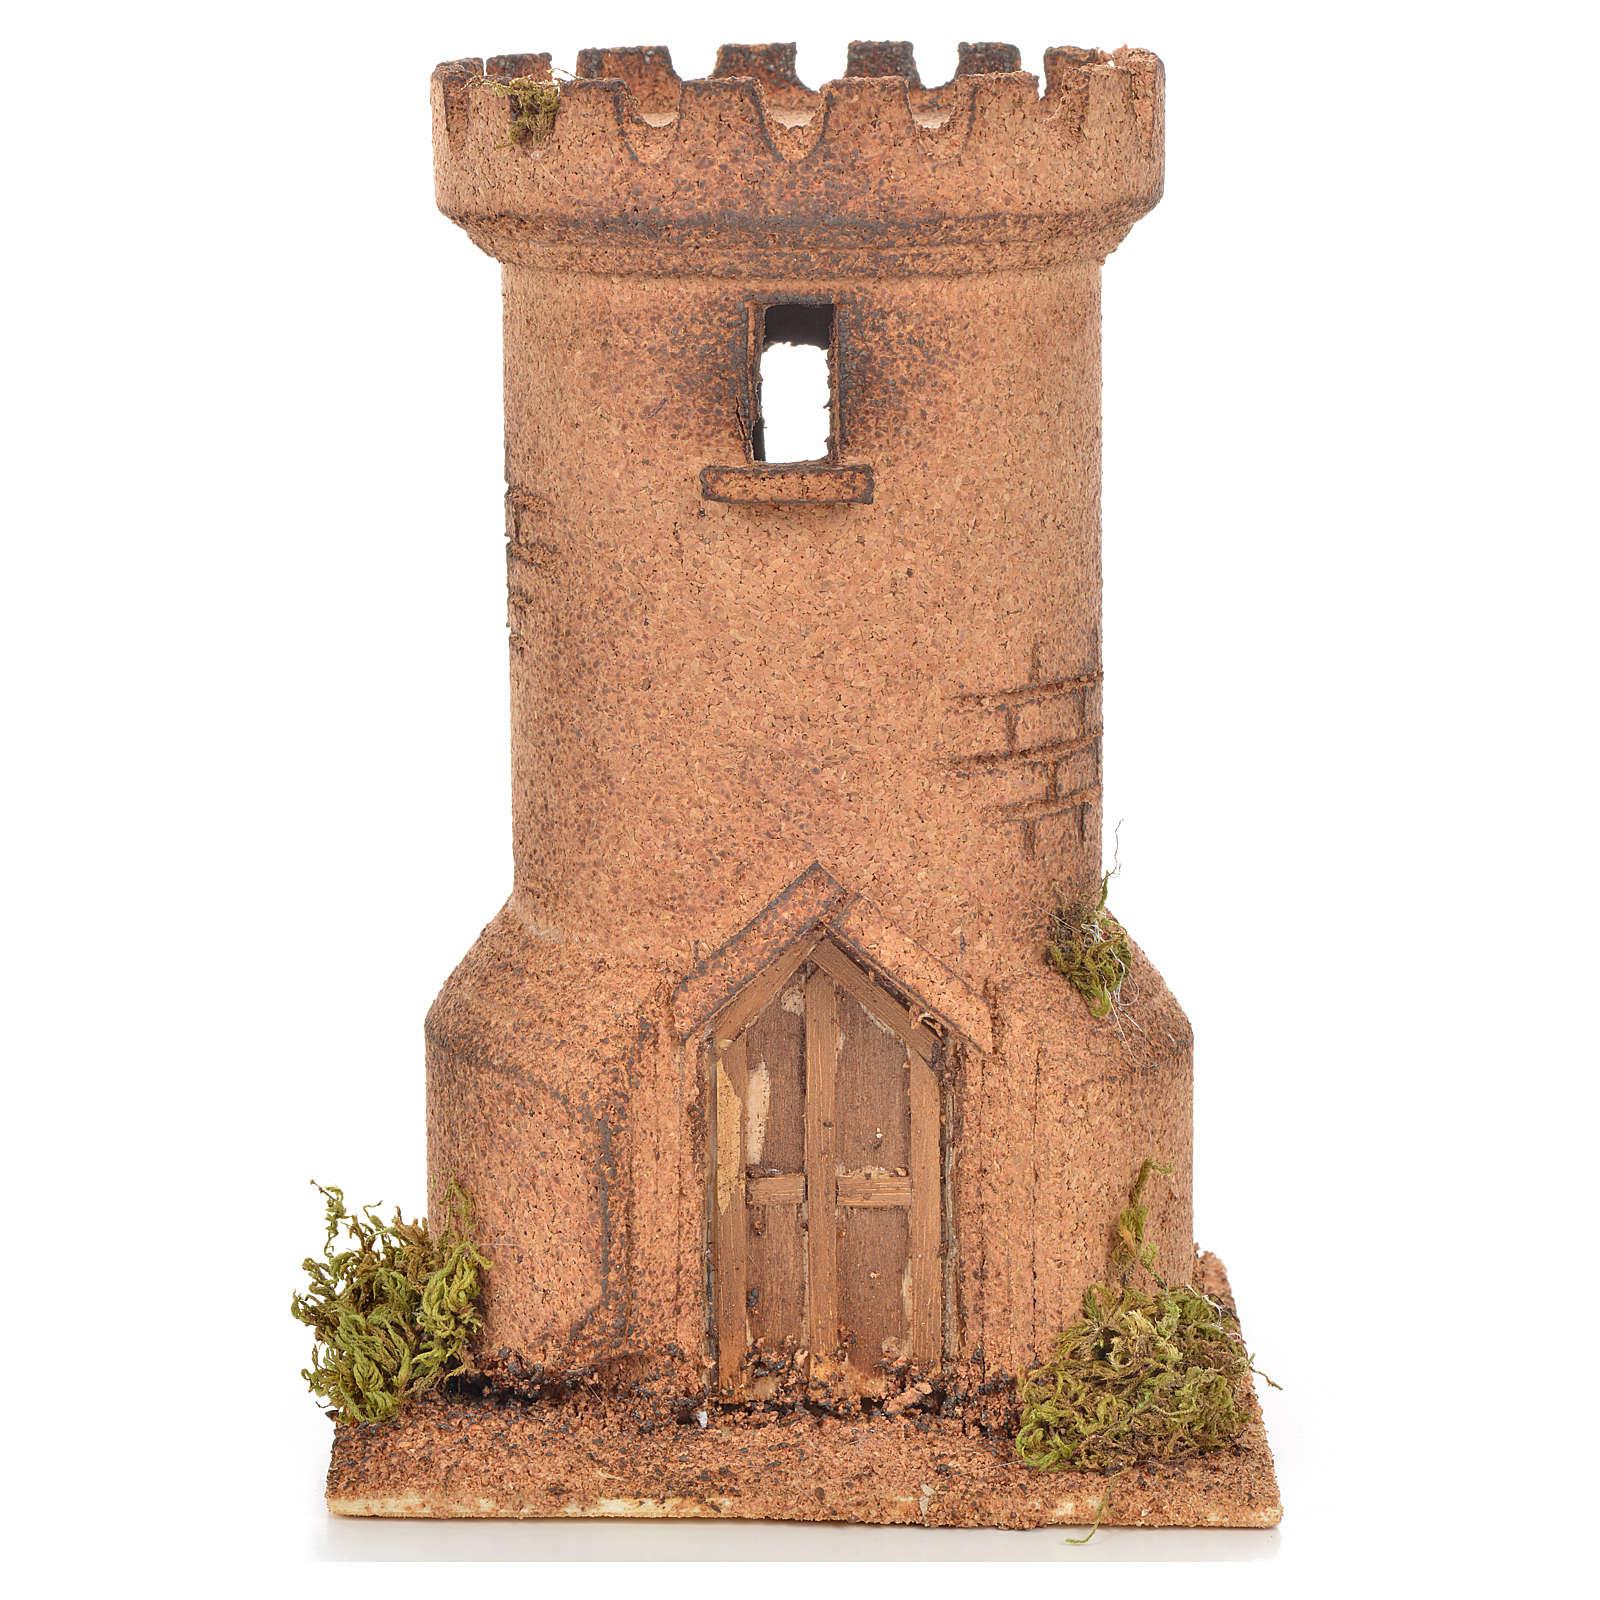 Torre de cortiça presépio napolitano 13x13x20,5 cm 4